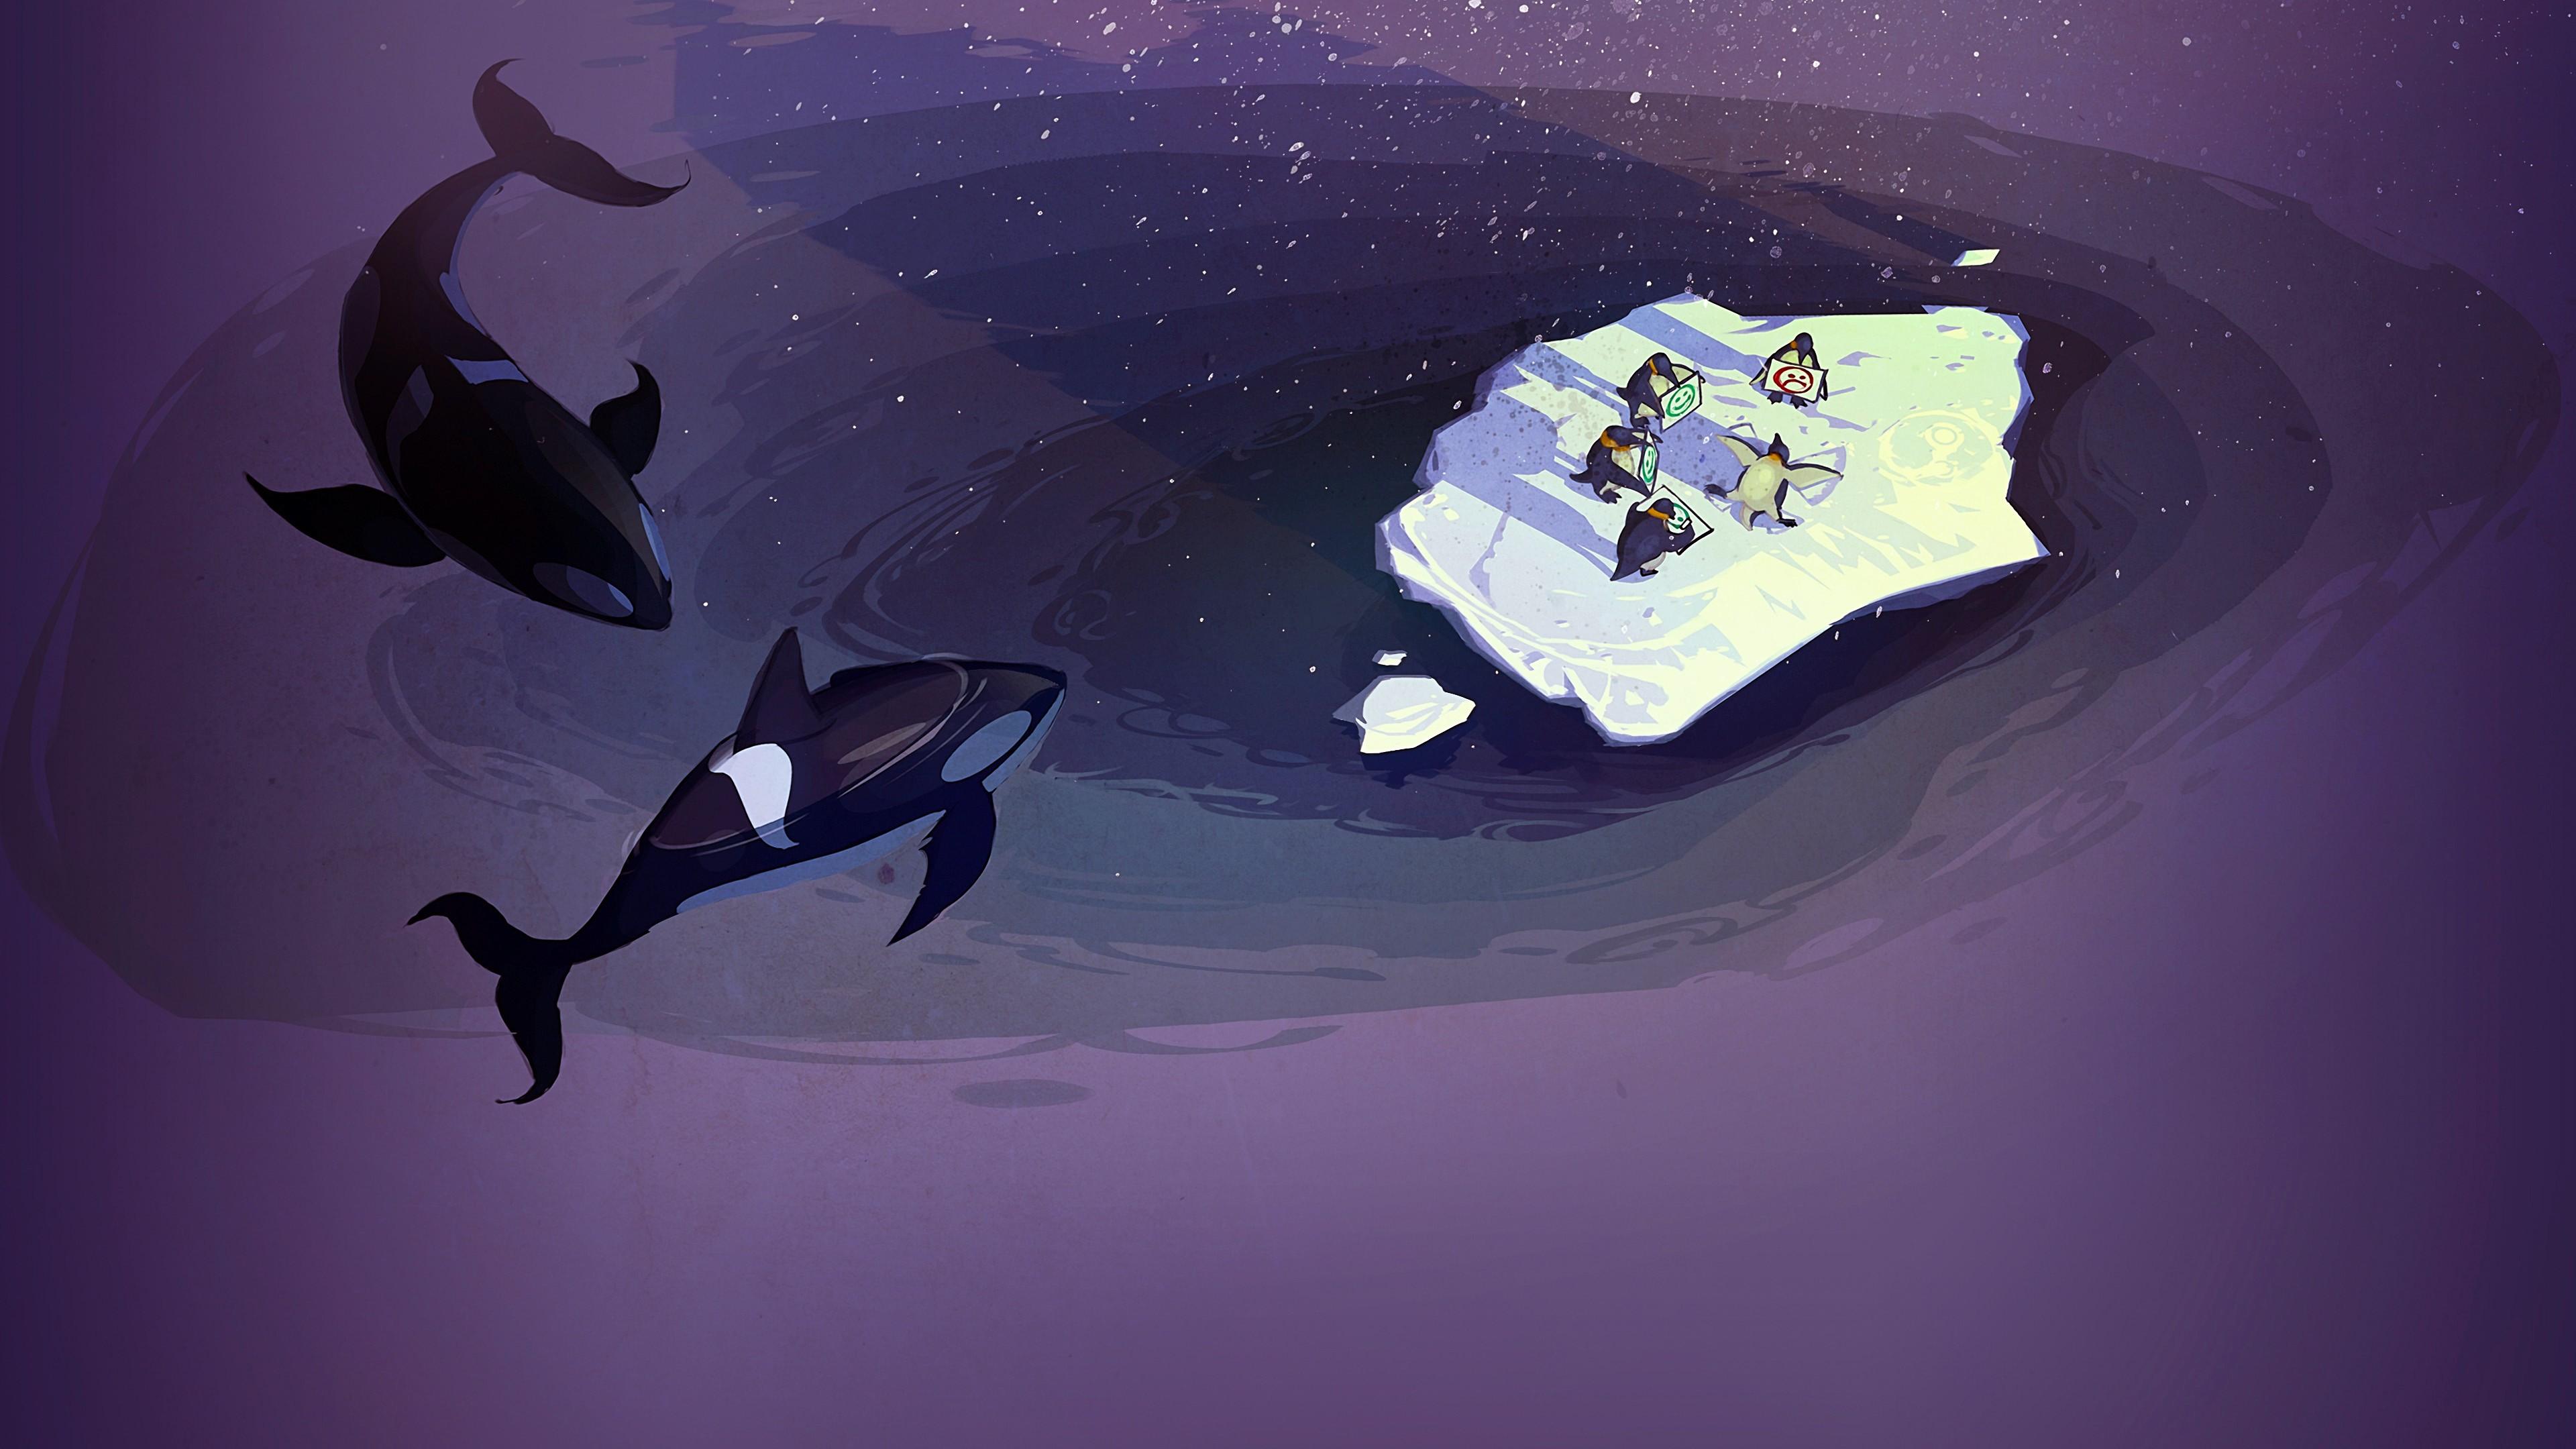 General 3840x2160 Steam (software) concept art penguins orca sea humor purple violet